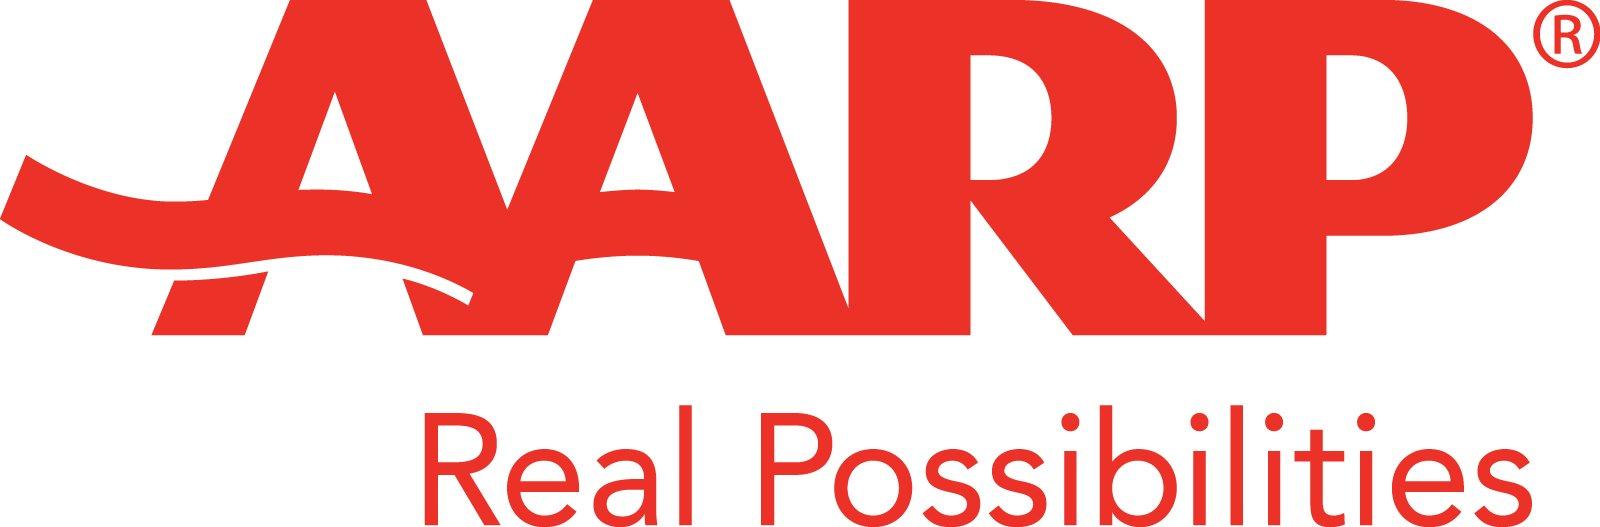 AARP-real-possibilities-logo1